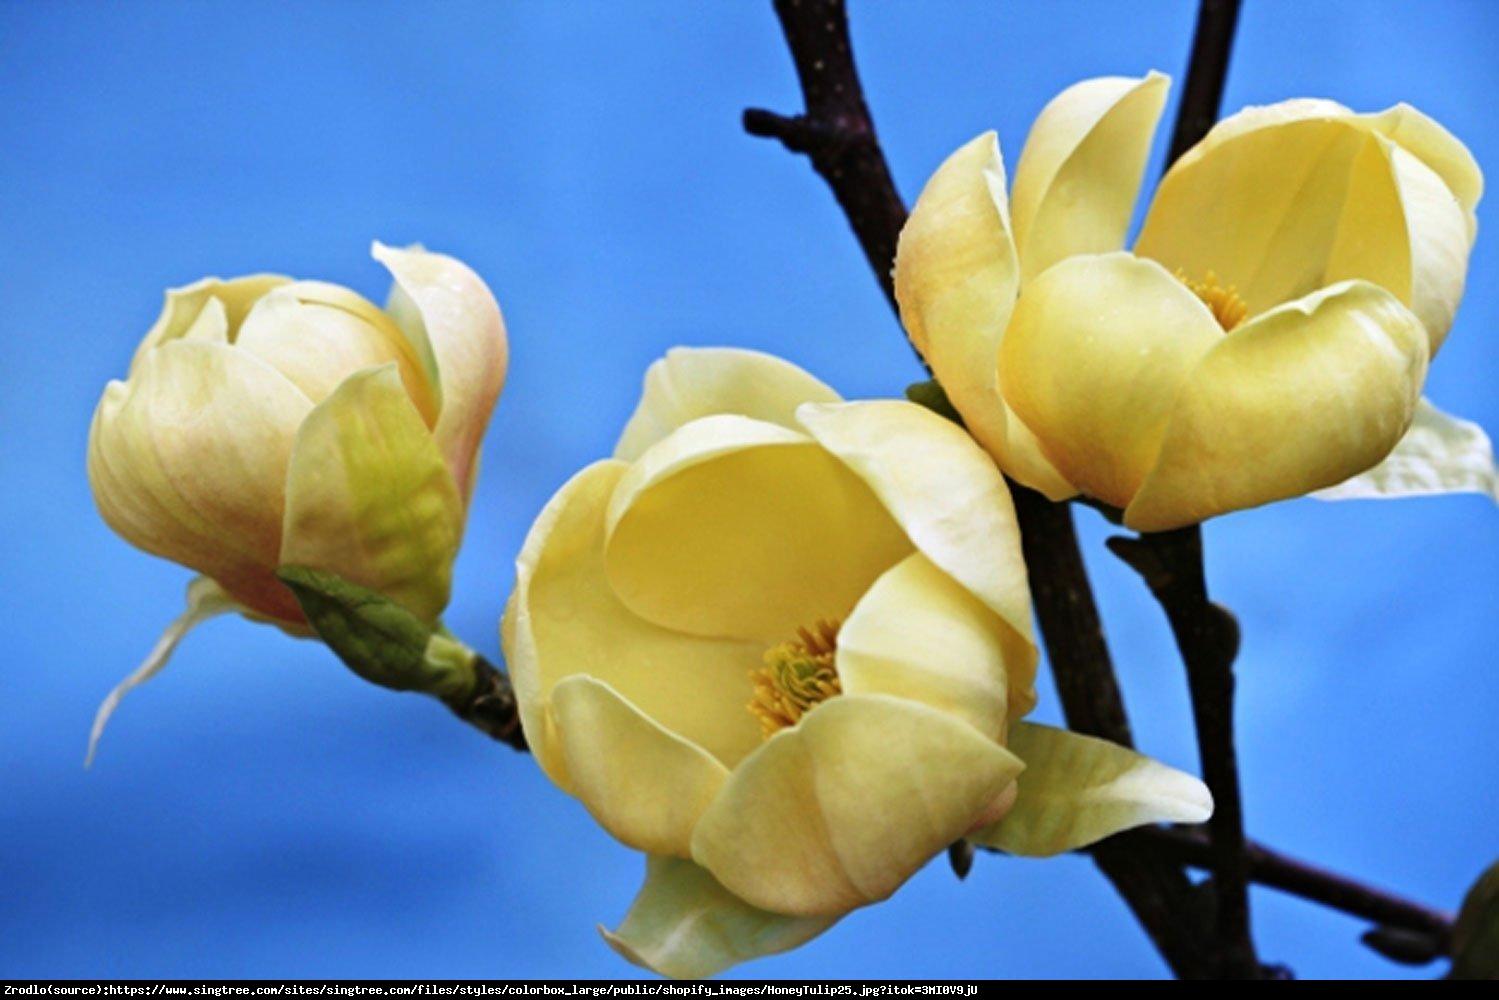 Magnolia Honey Tulip - Magnolia Honey Tulip